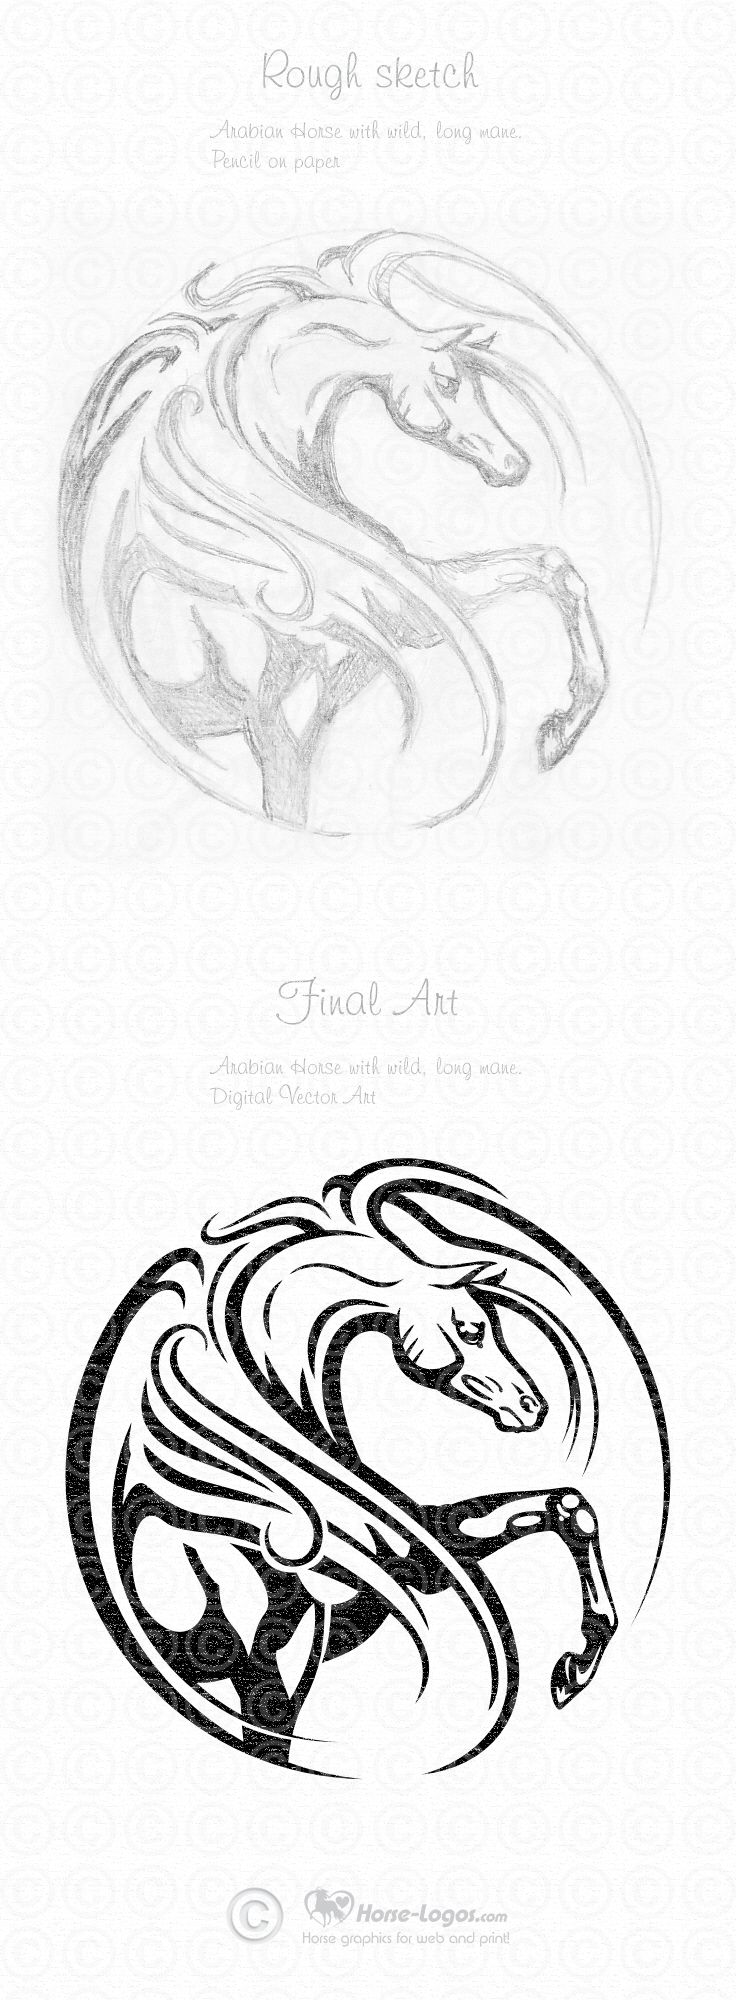 Arabian Horse Graphic Art Design by Joni Solis of Horse-Logos.com   Final art…